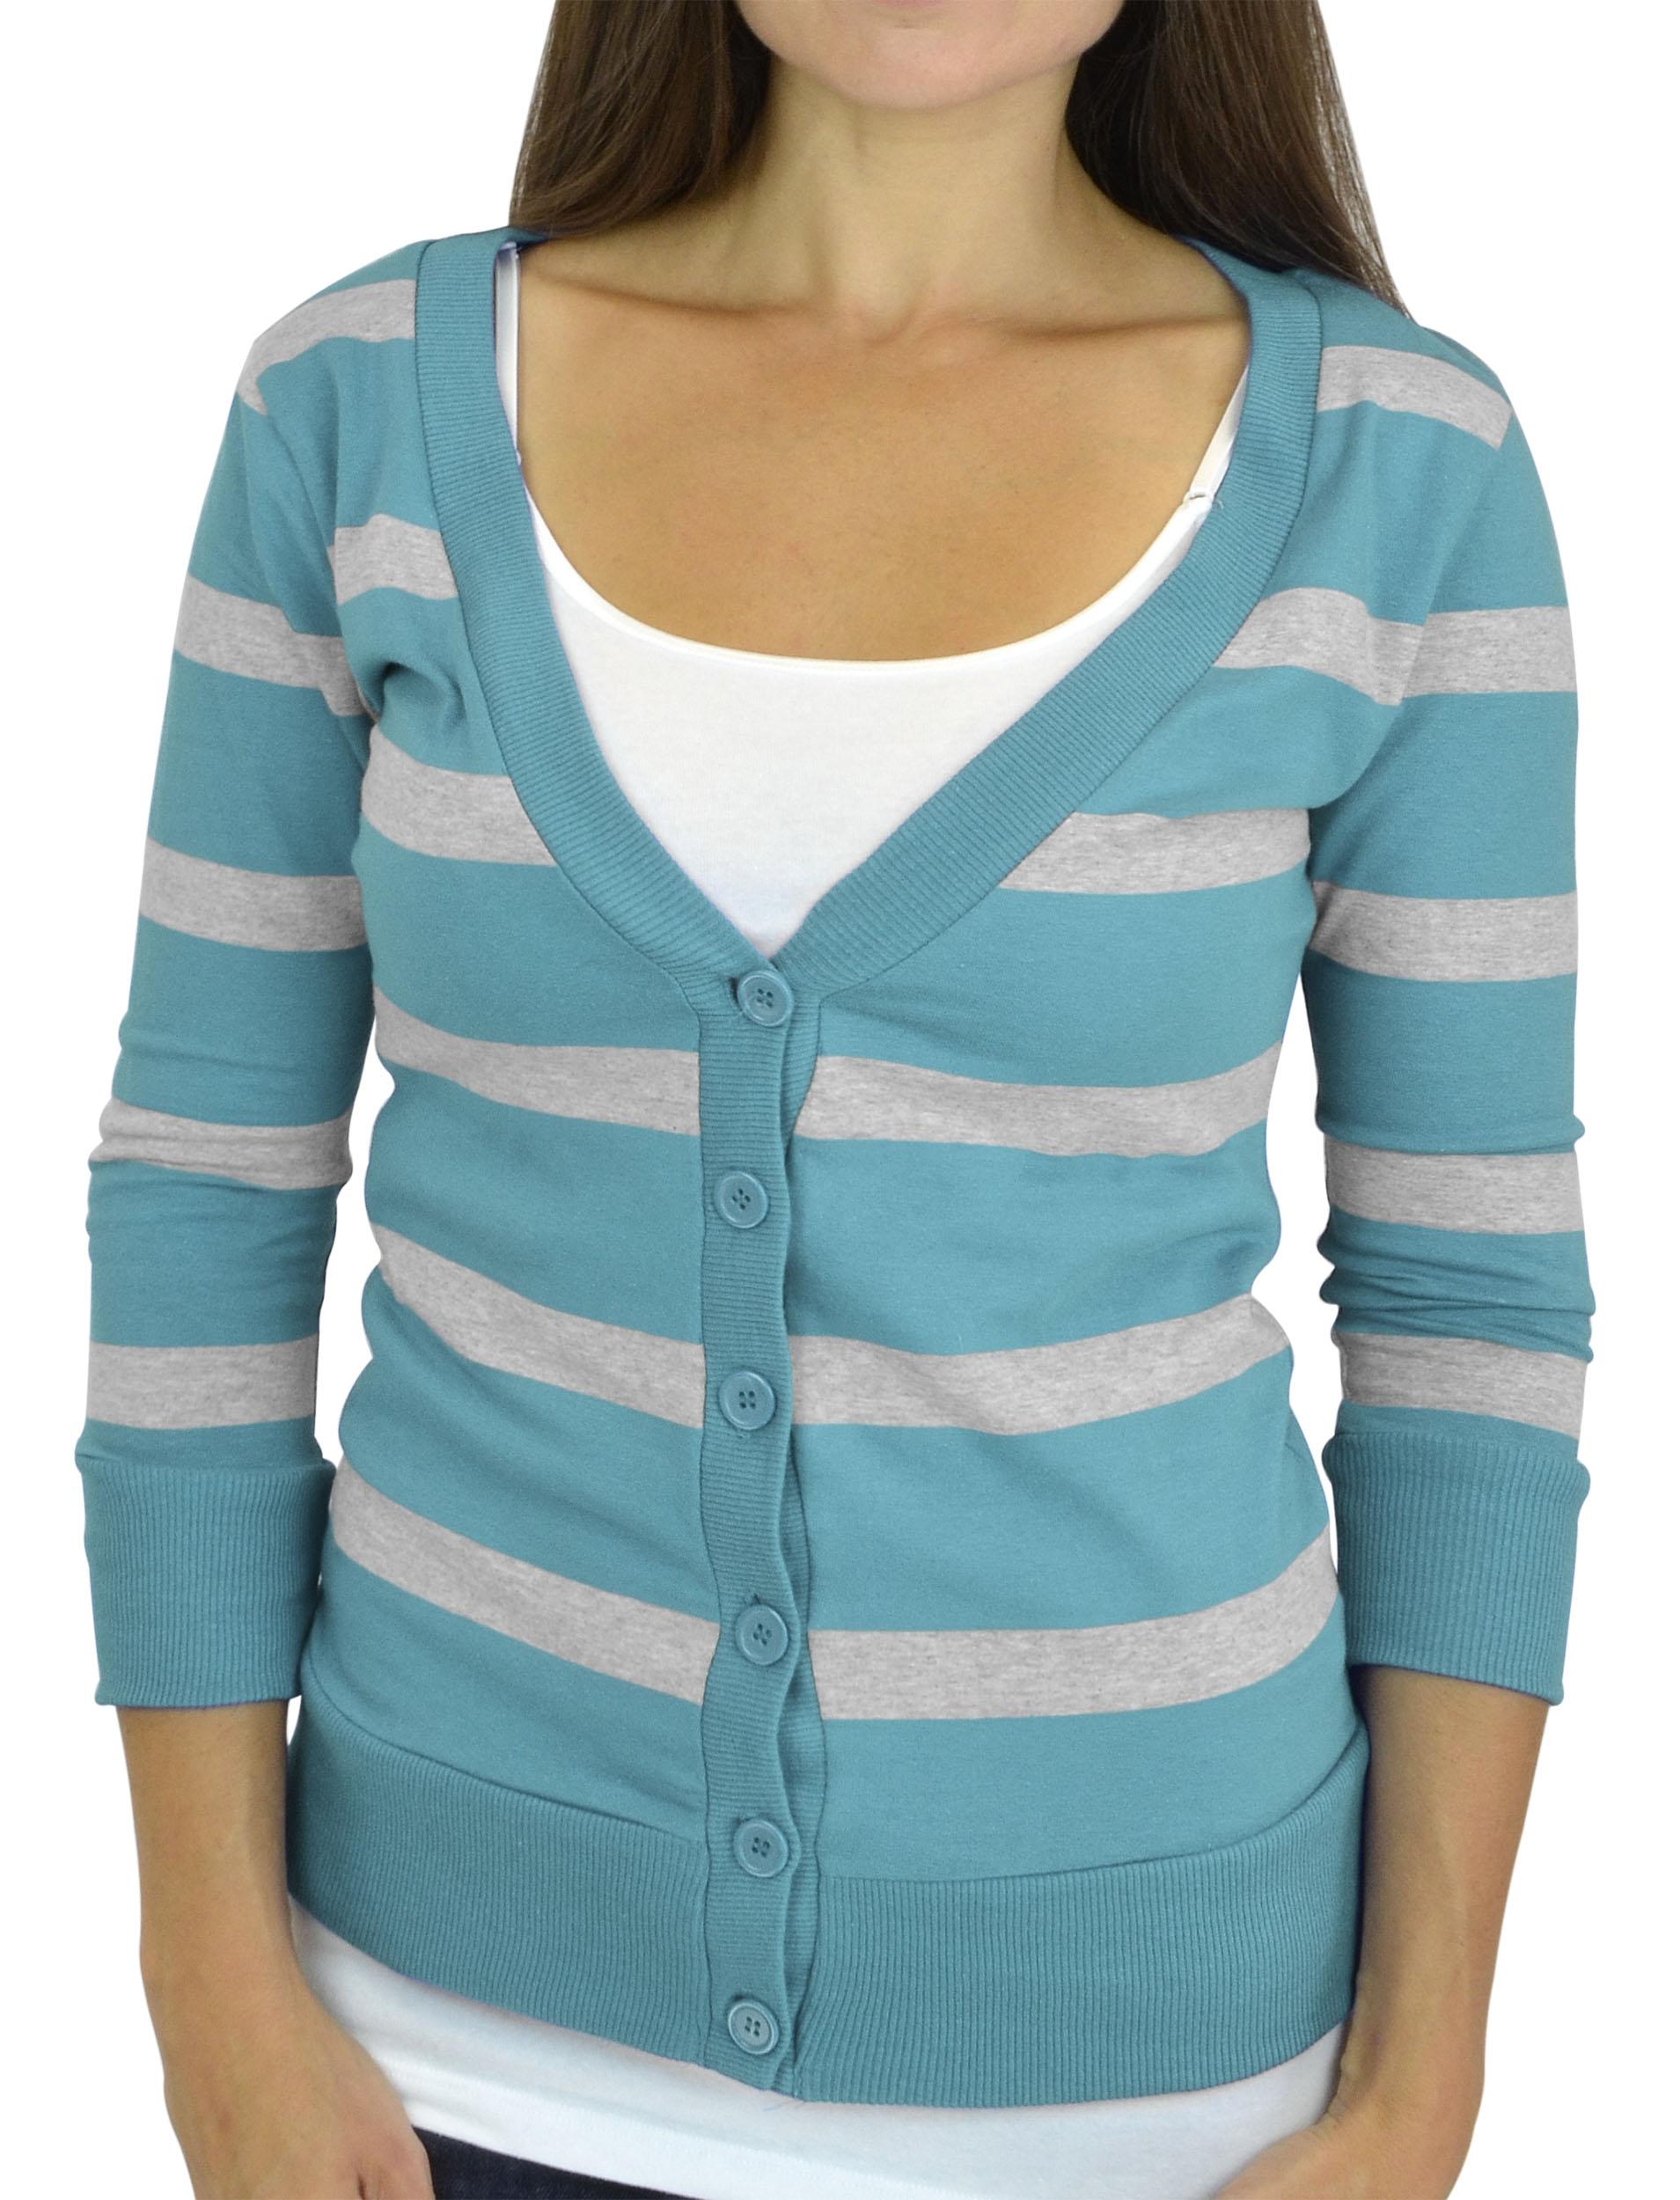 Belle Donne - Women / Girl Junior Size Soft 3/4 Sleeve V-Neck Sweater Cardigans - Heather Gray/Medium